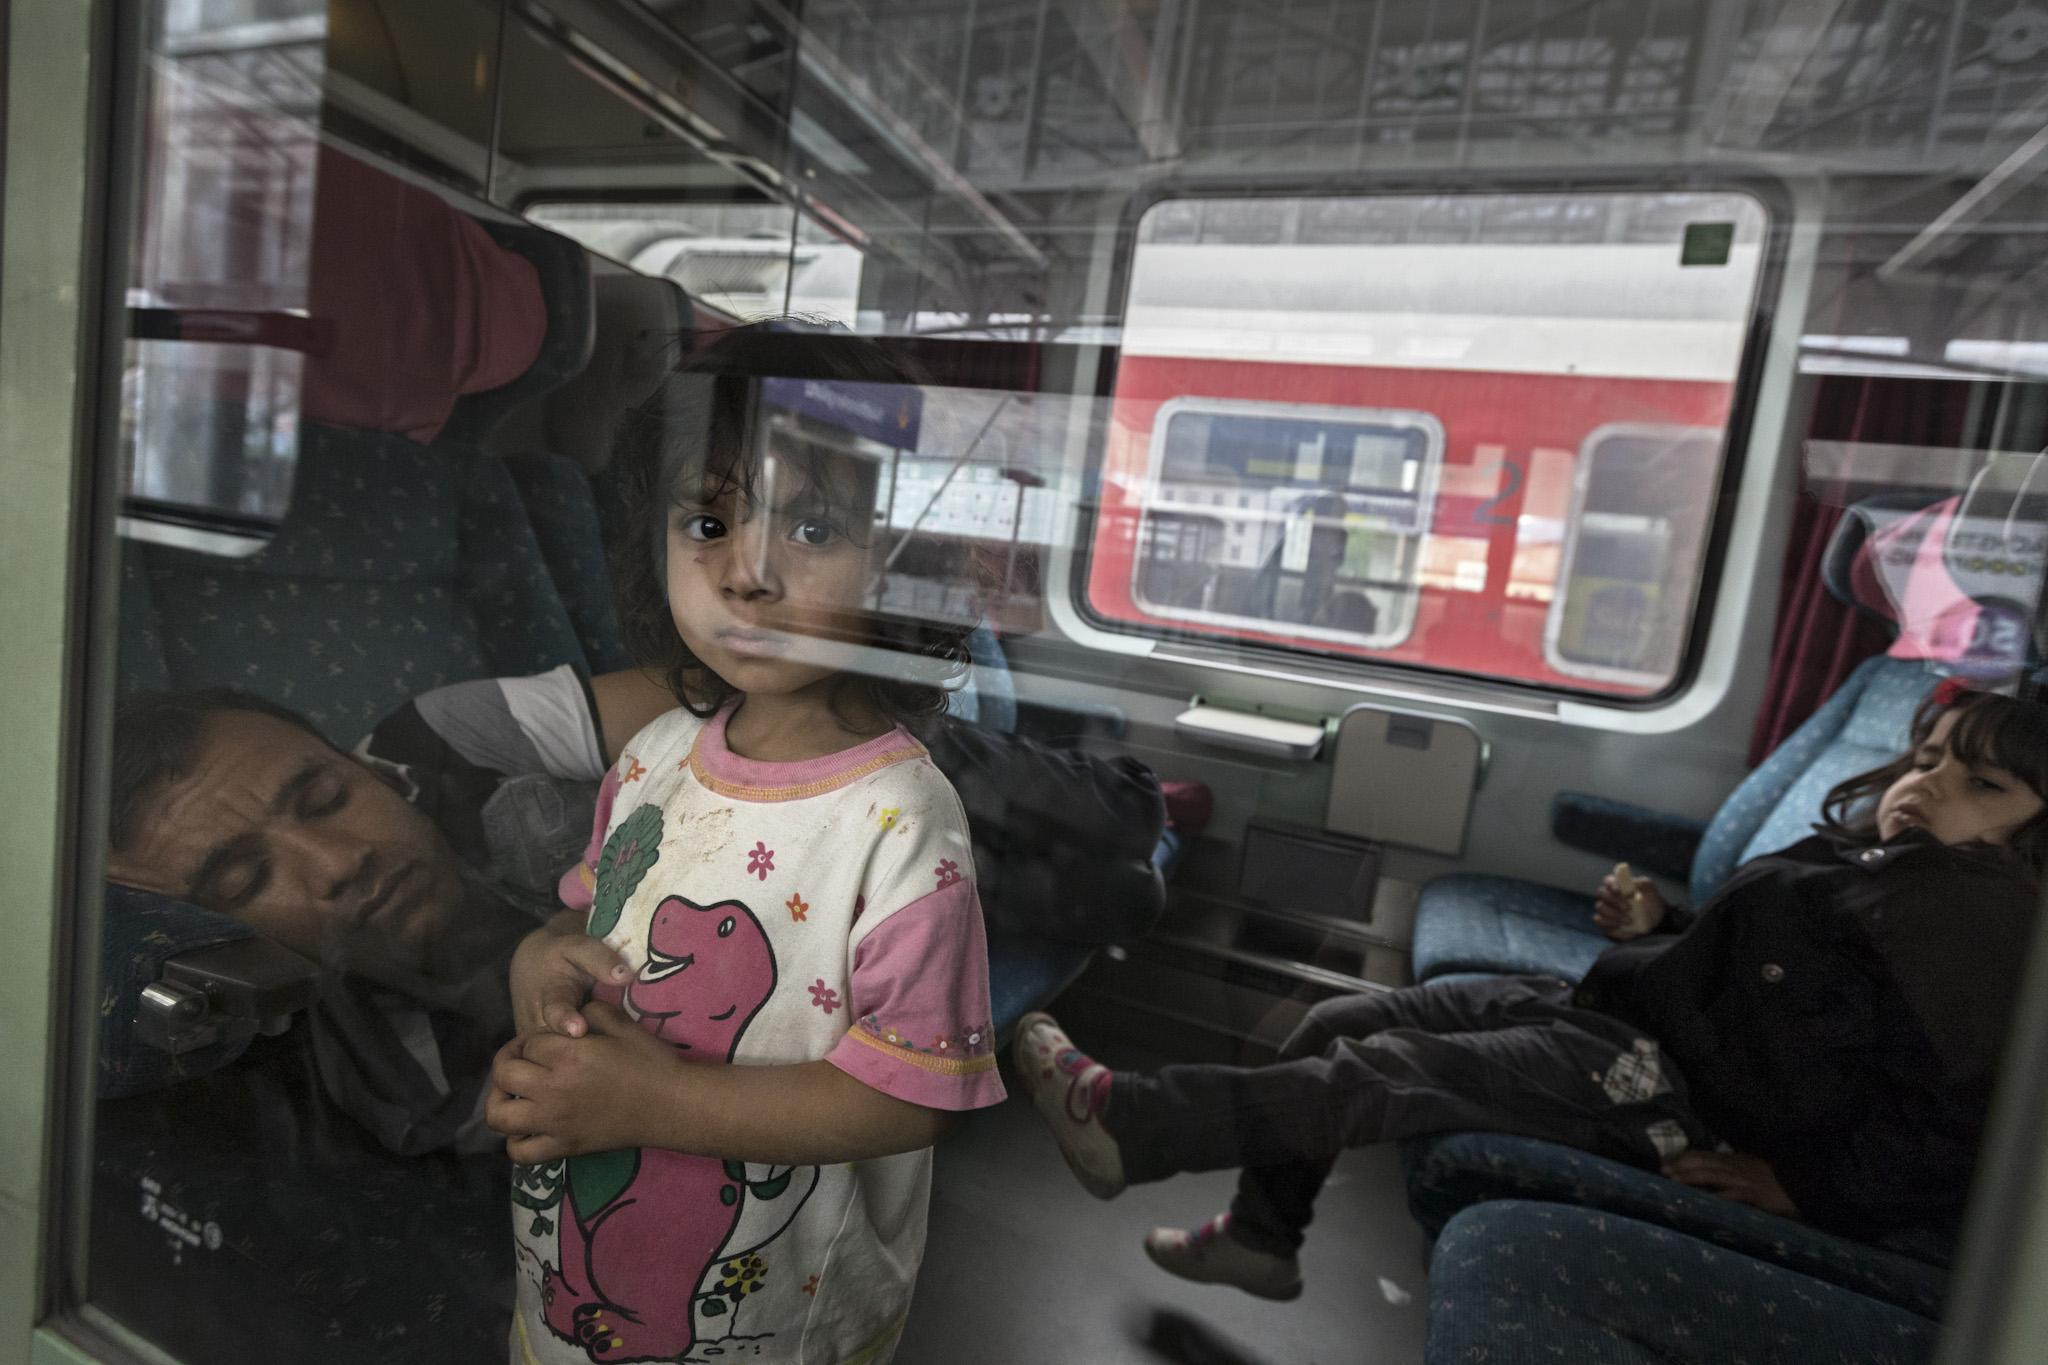 afghanische Flüchtlingsfamilie